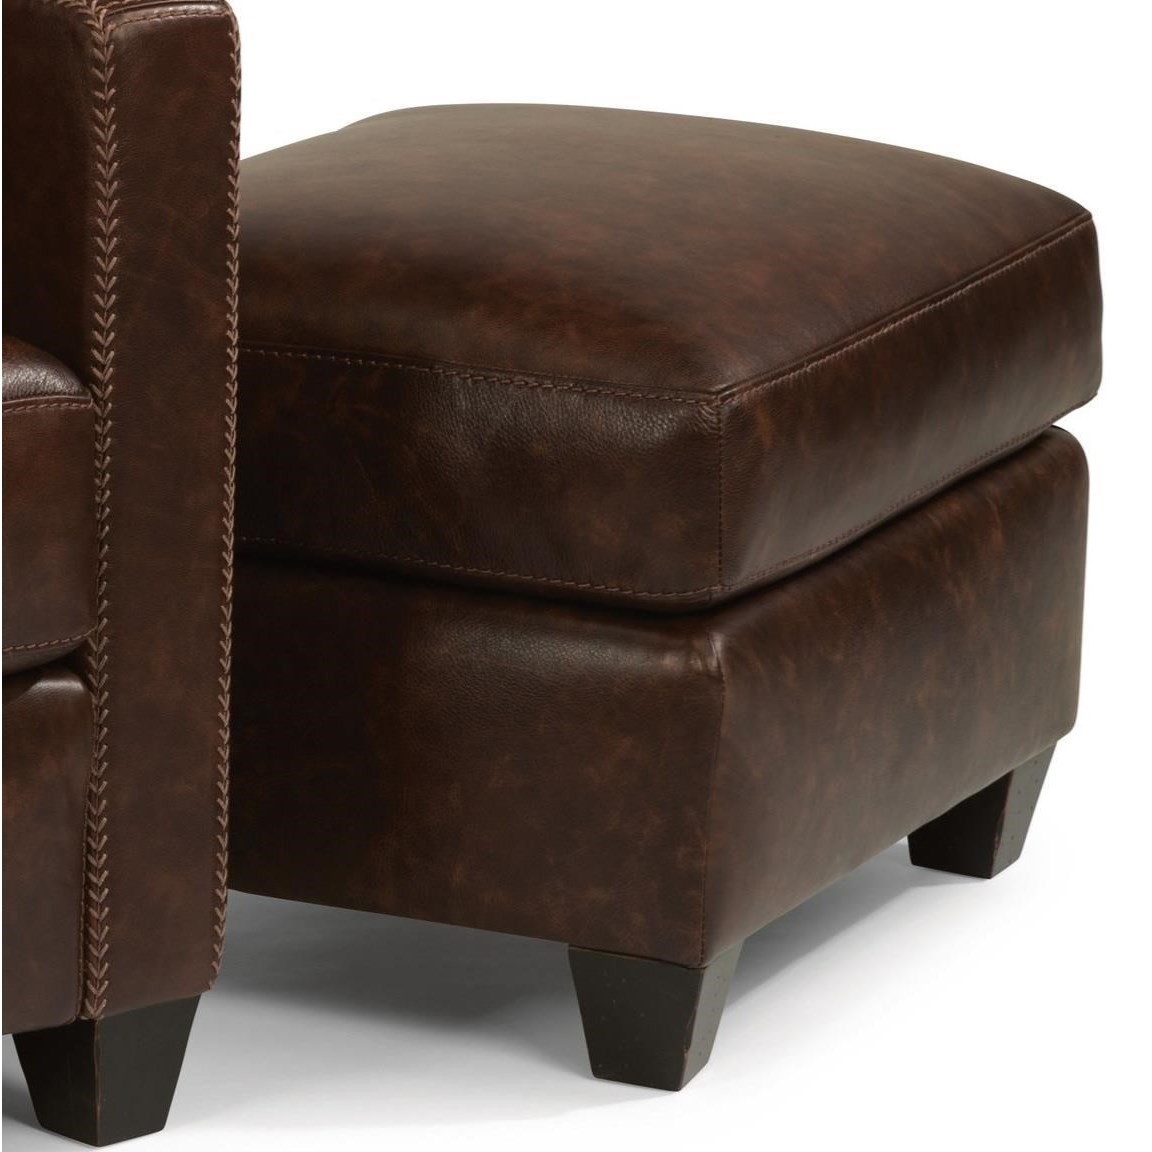 Flexsteel Latitudes Roscoe Modern Rustic Chair Ottoman